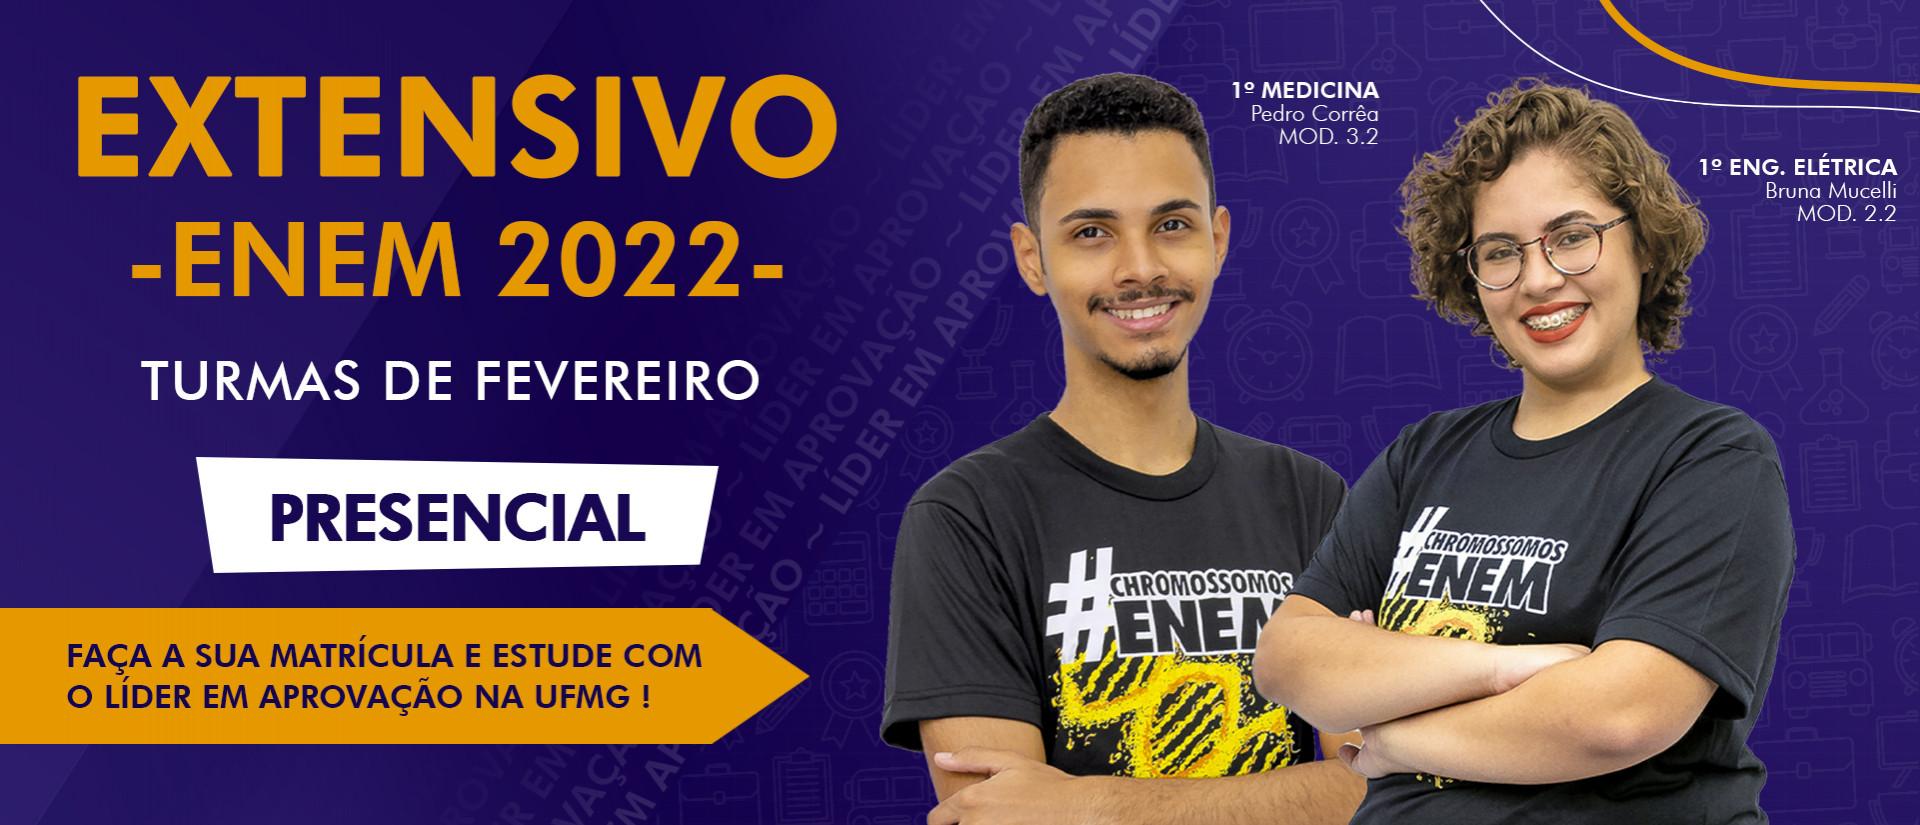 18-10 Pre ENEM-Extensivo 2022-01_Banner-rotativo